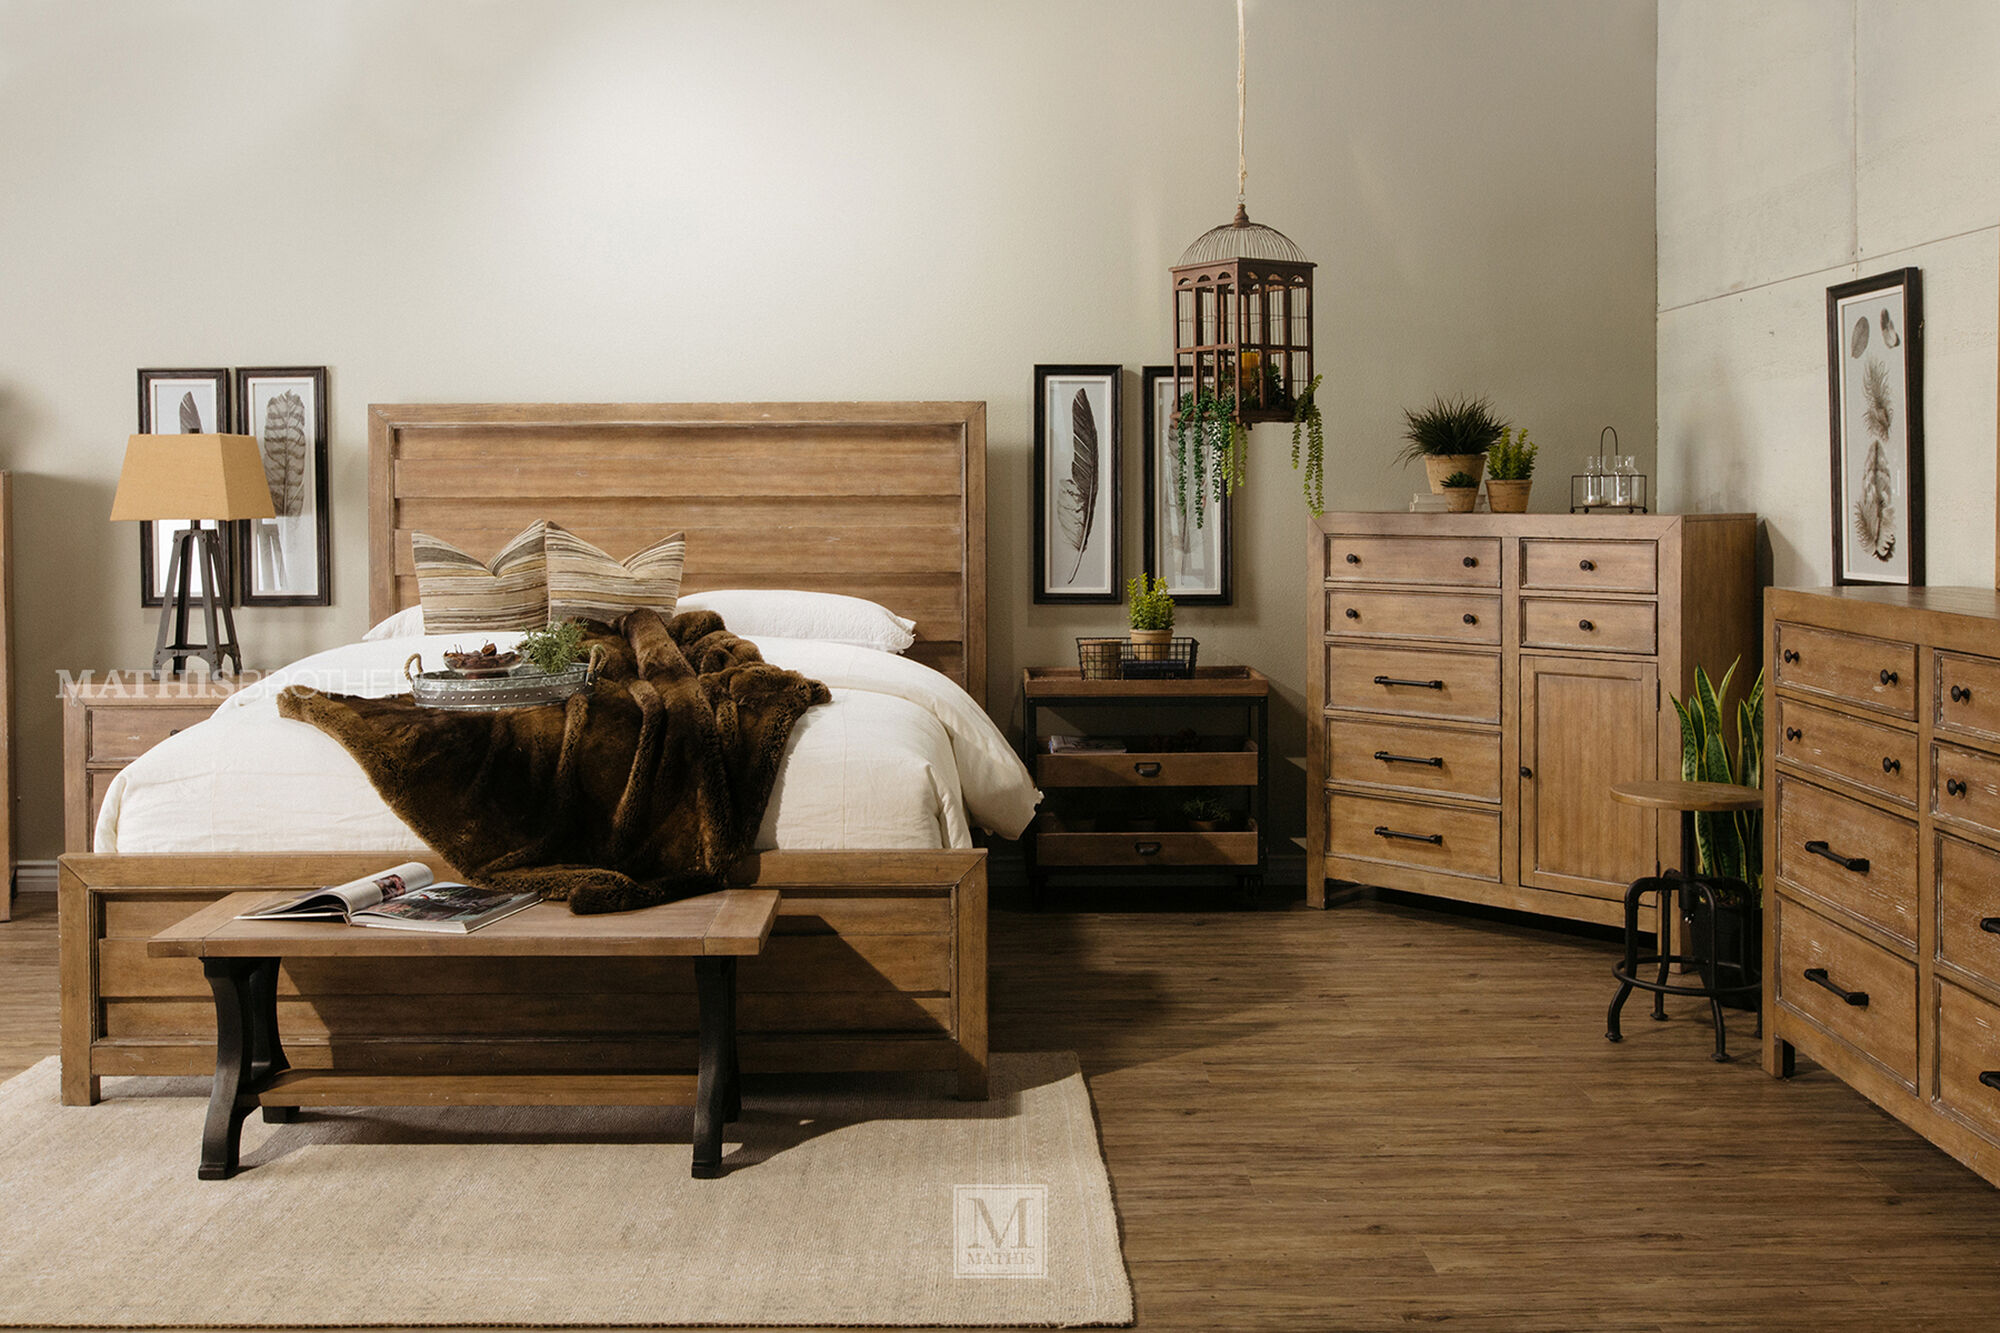 fourpiece contemporary bedroom set in light oak  mathis